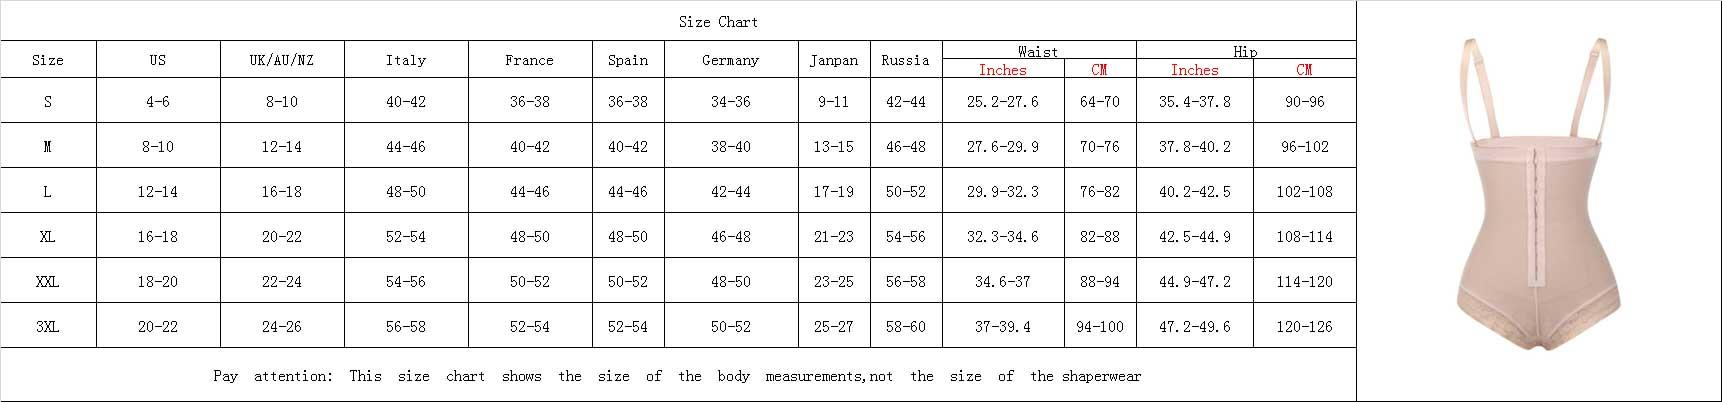 FeelinGirl High Waist Shaping Shorts Stomach Shaper Under Dress Body Shaper